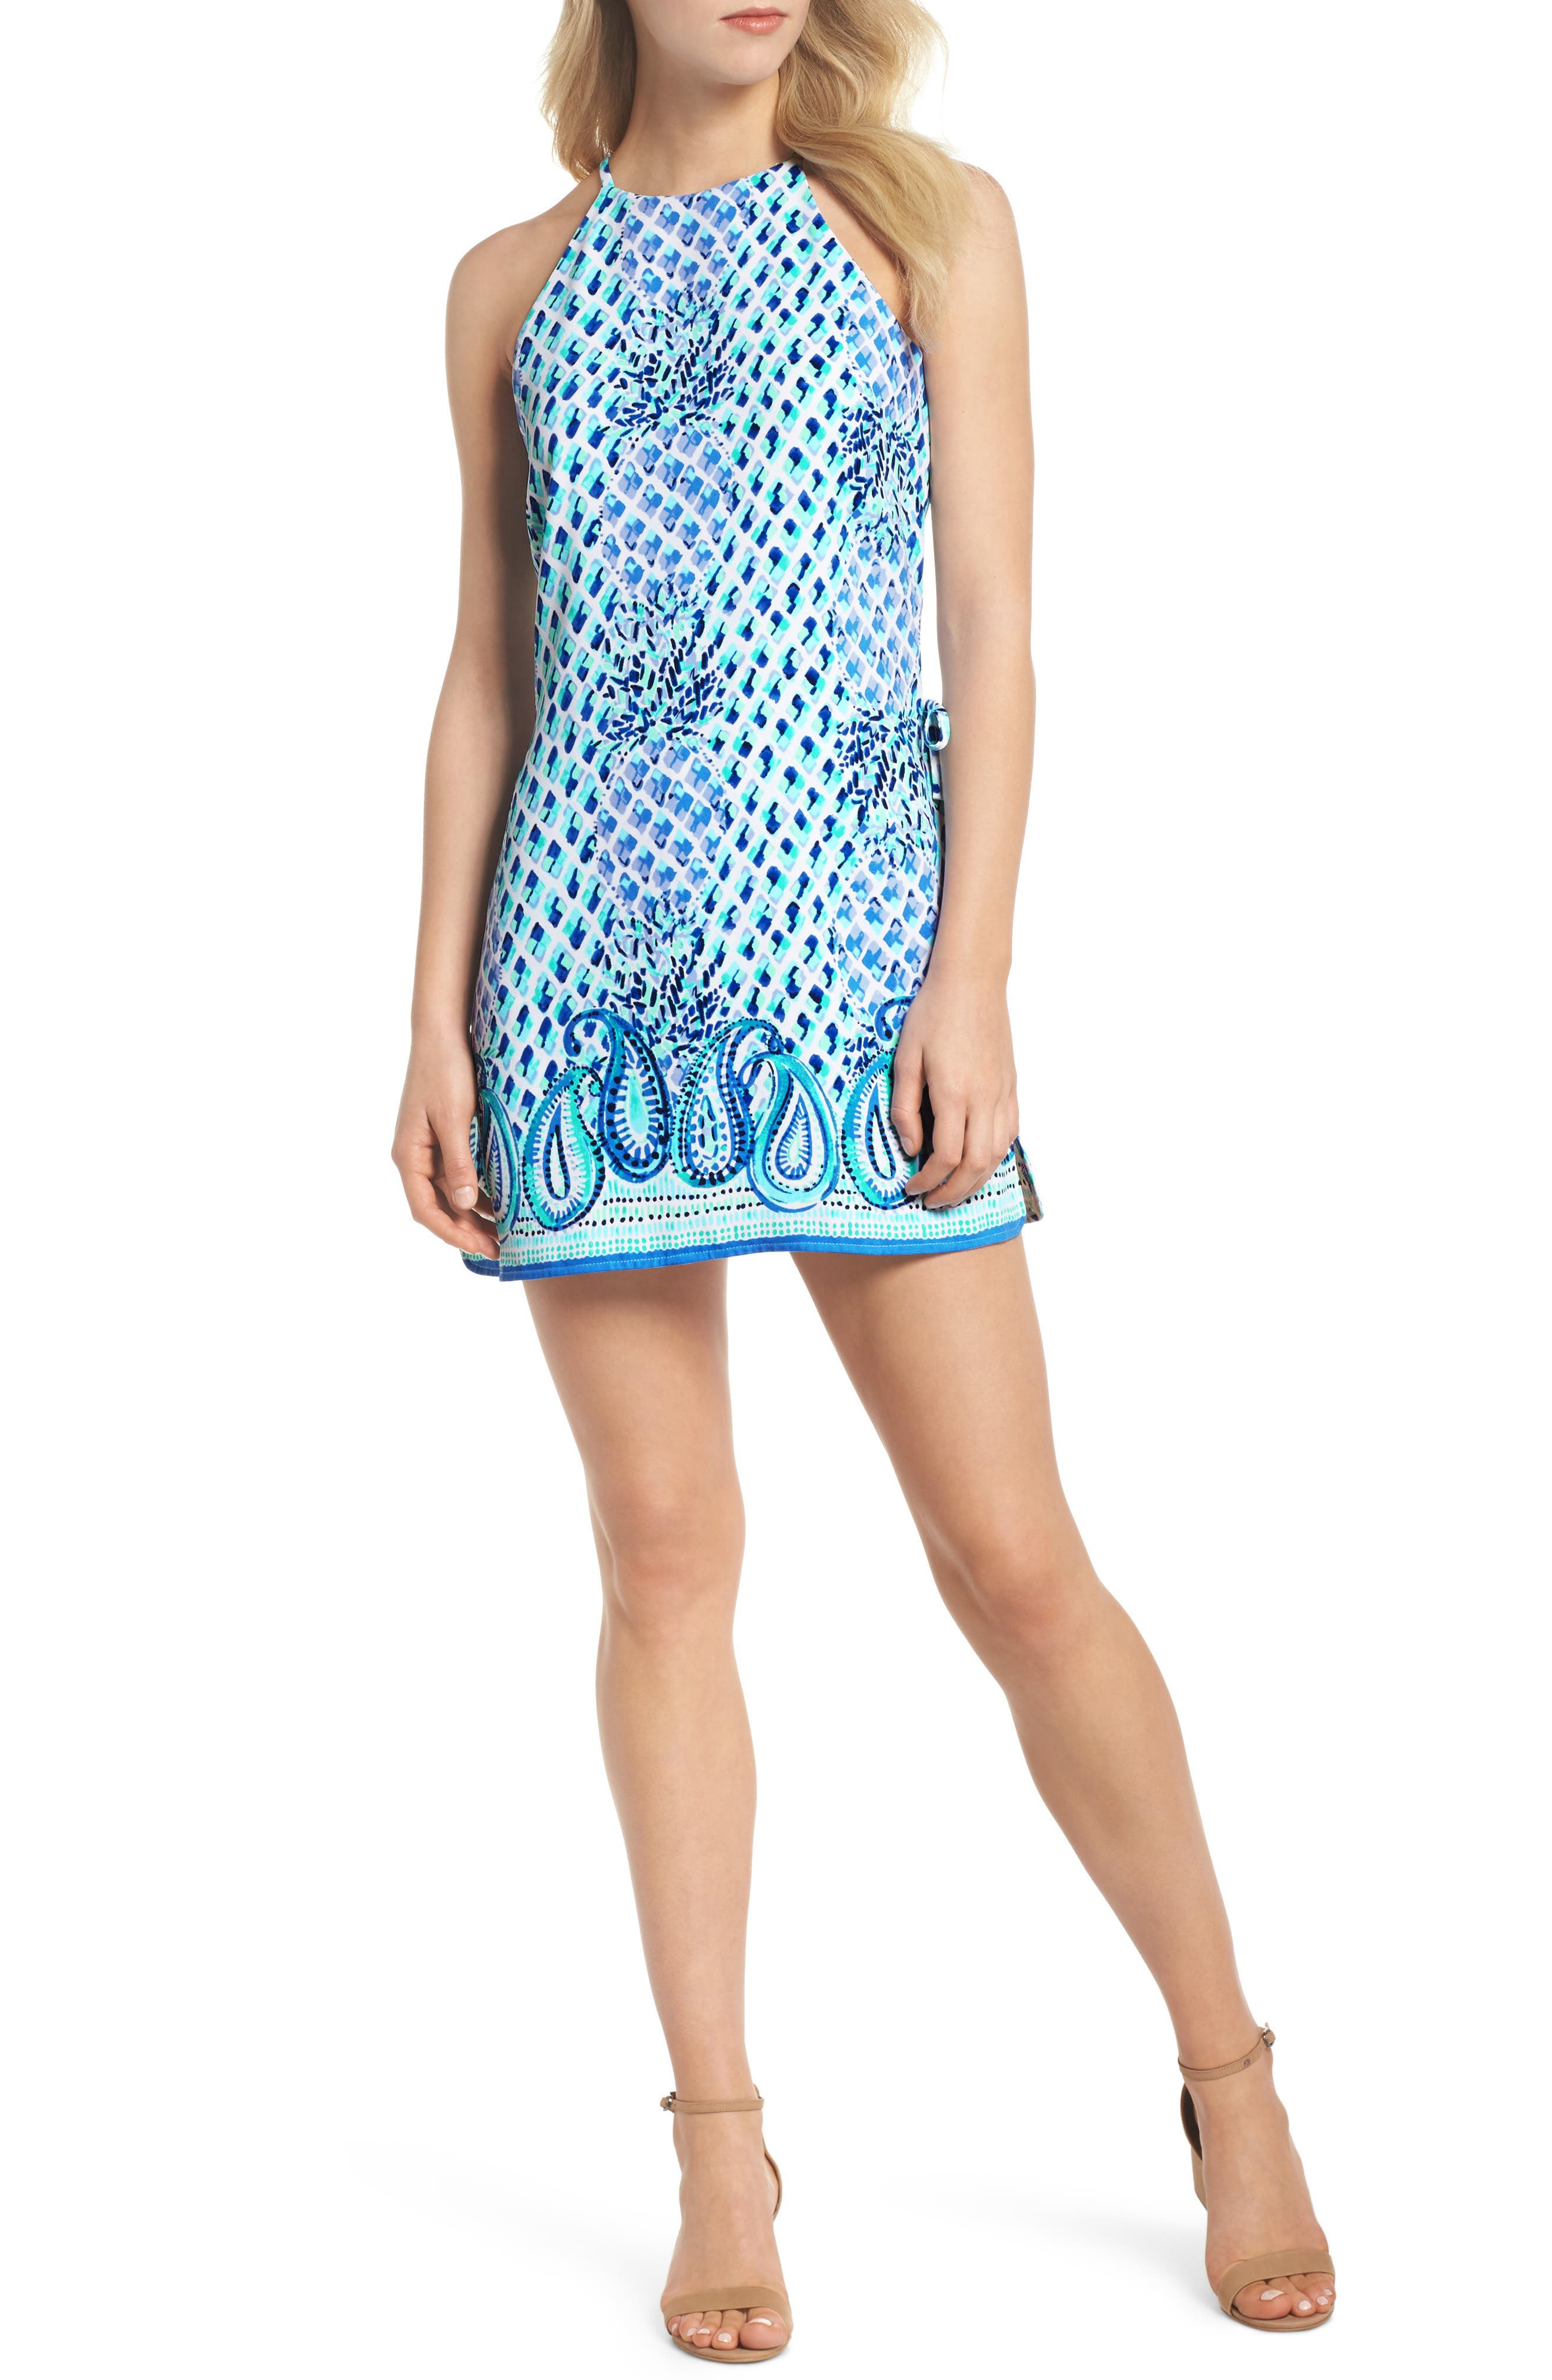 Pearl Romper Dress,                         Main,                         color, Resort White Toe In